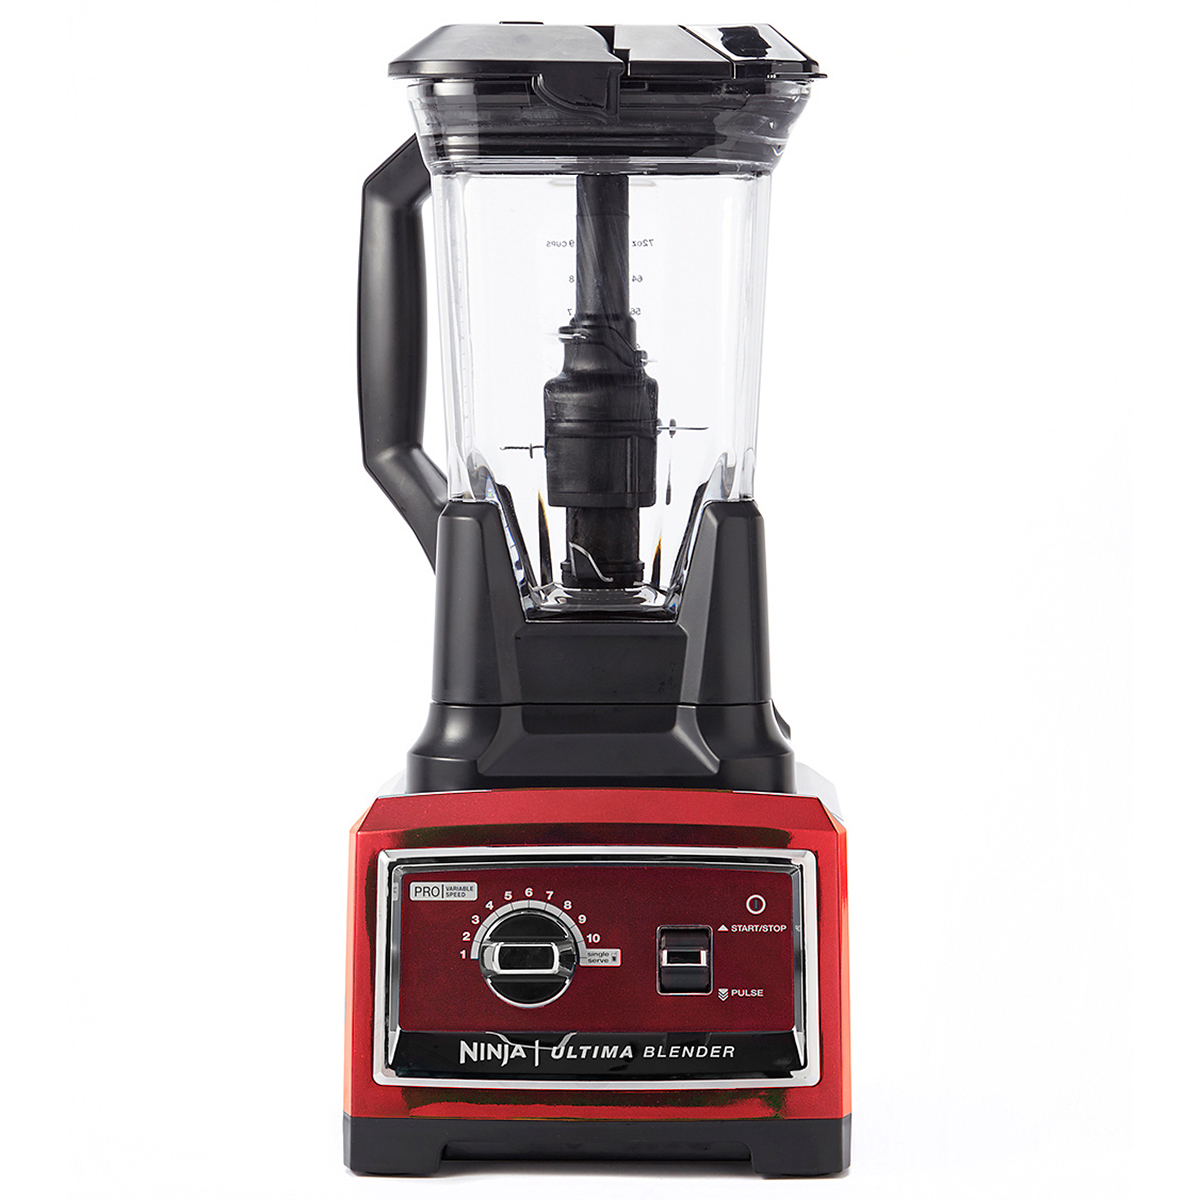 Ninja Ultimate BL810 1500 Watt Blender, Cinnamon, Refurbished